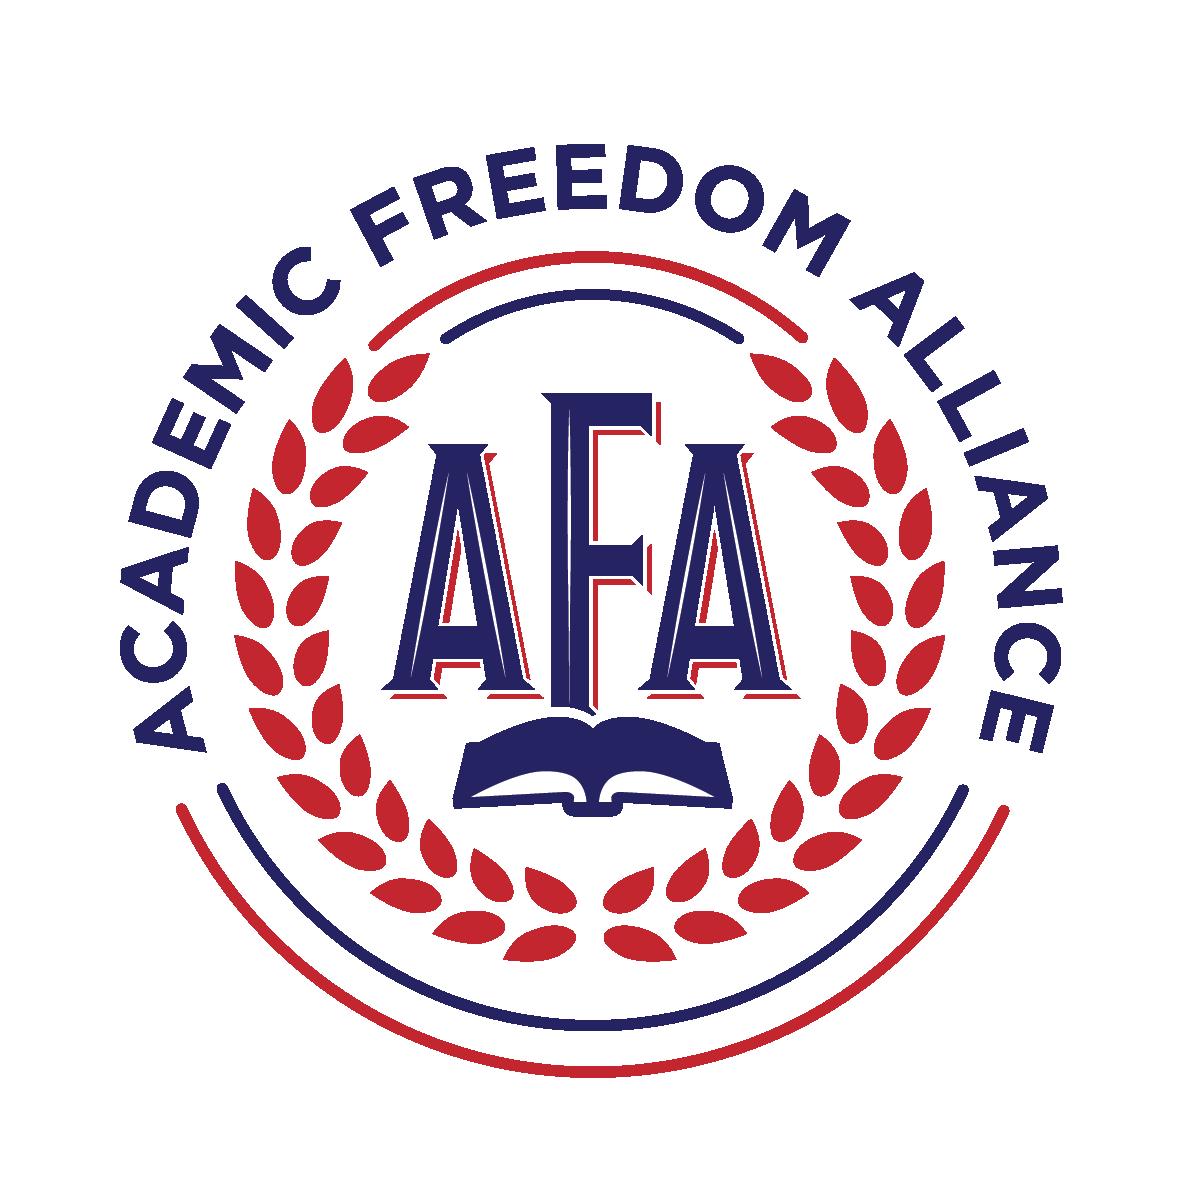 Academic Freedom Alliance